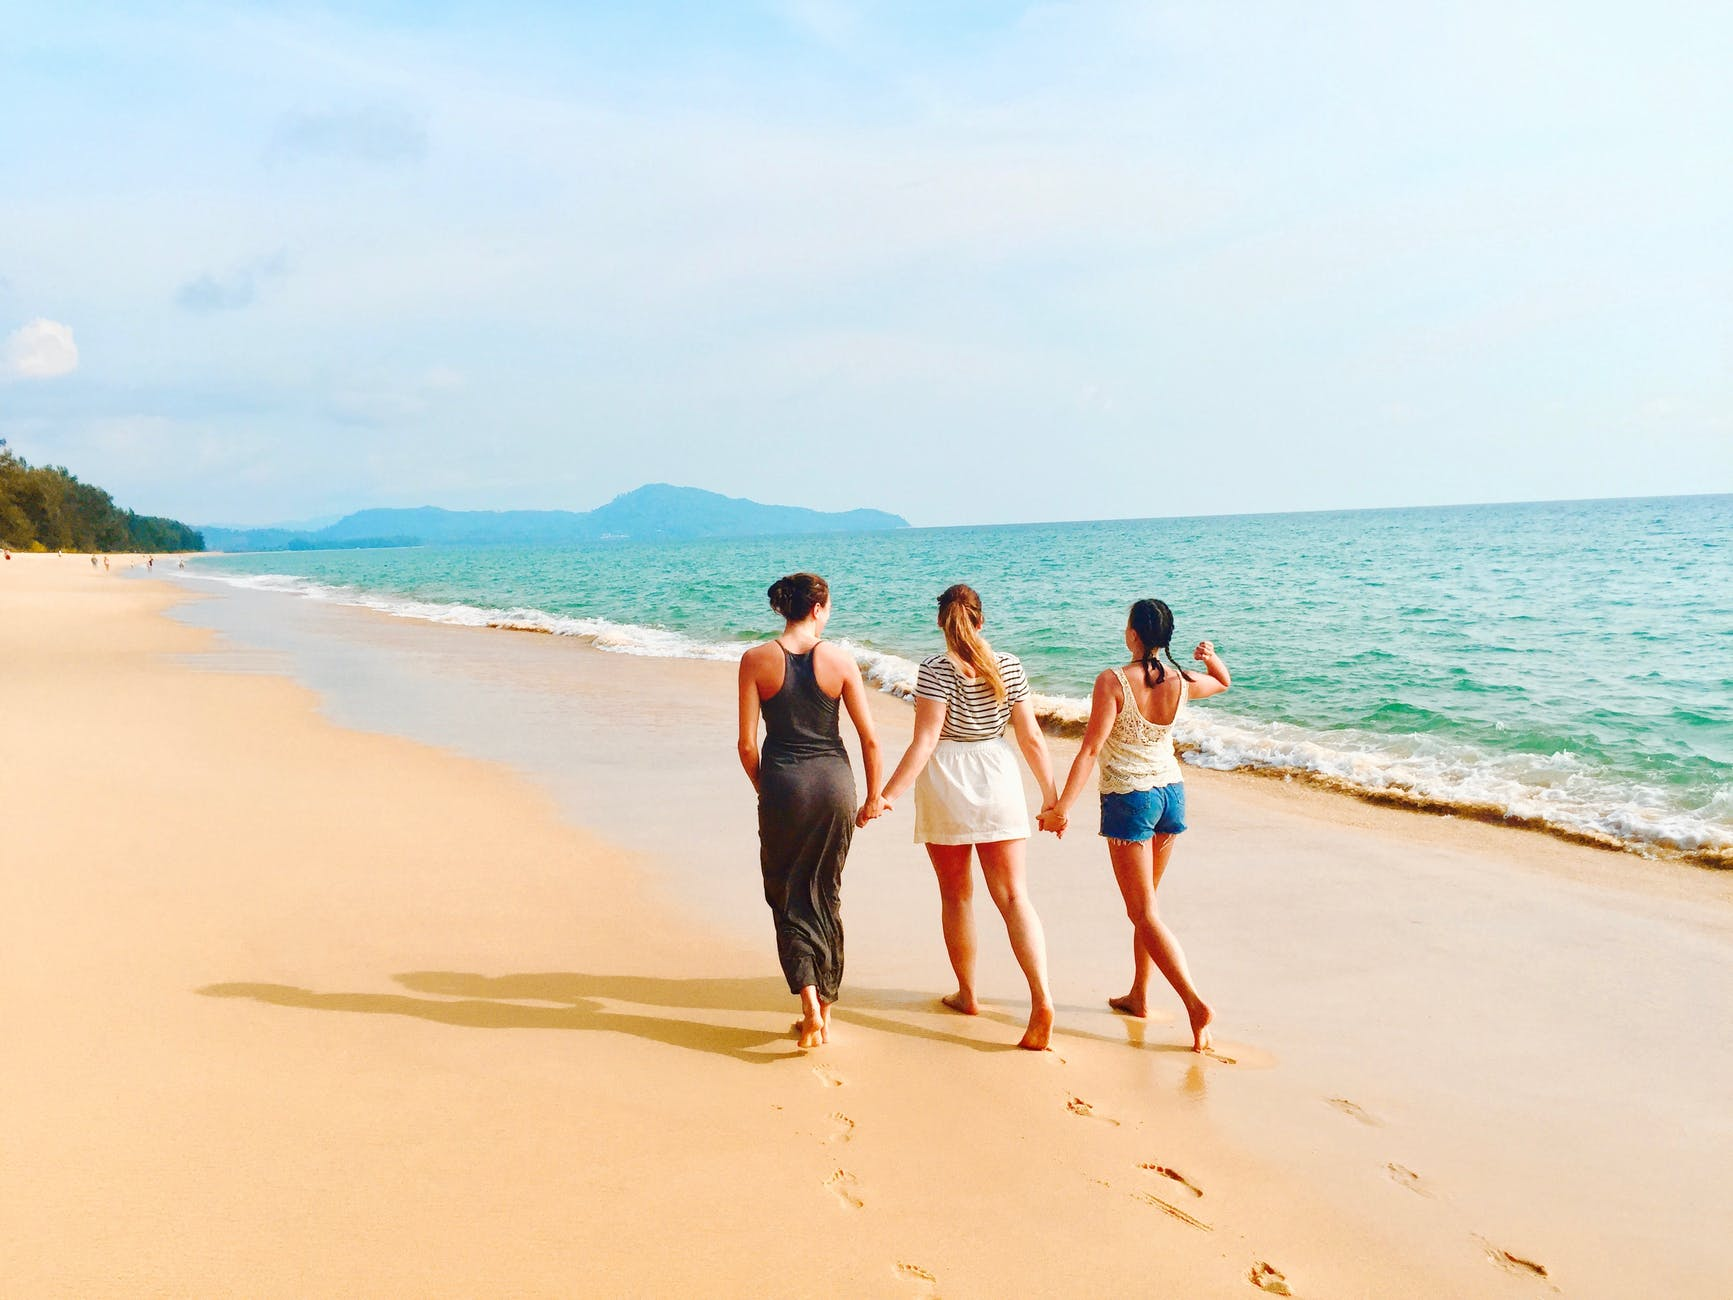 three women walking on seashore under blue sky